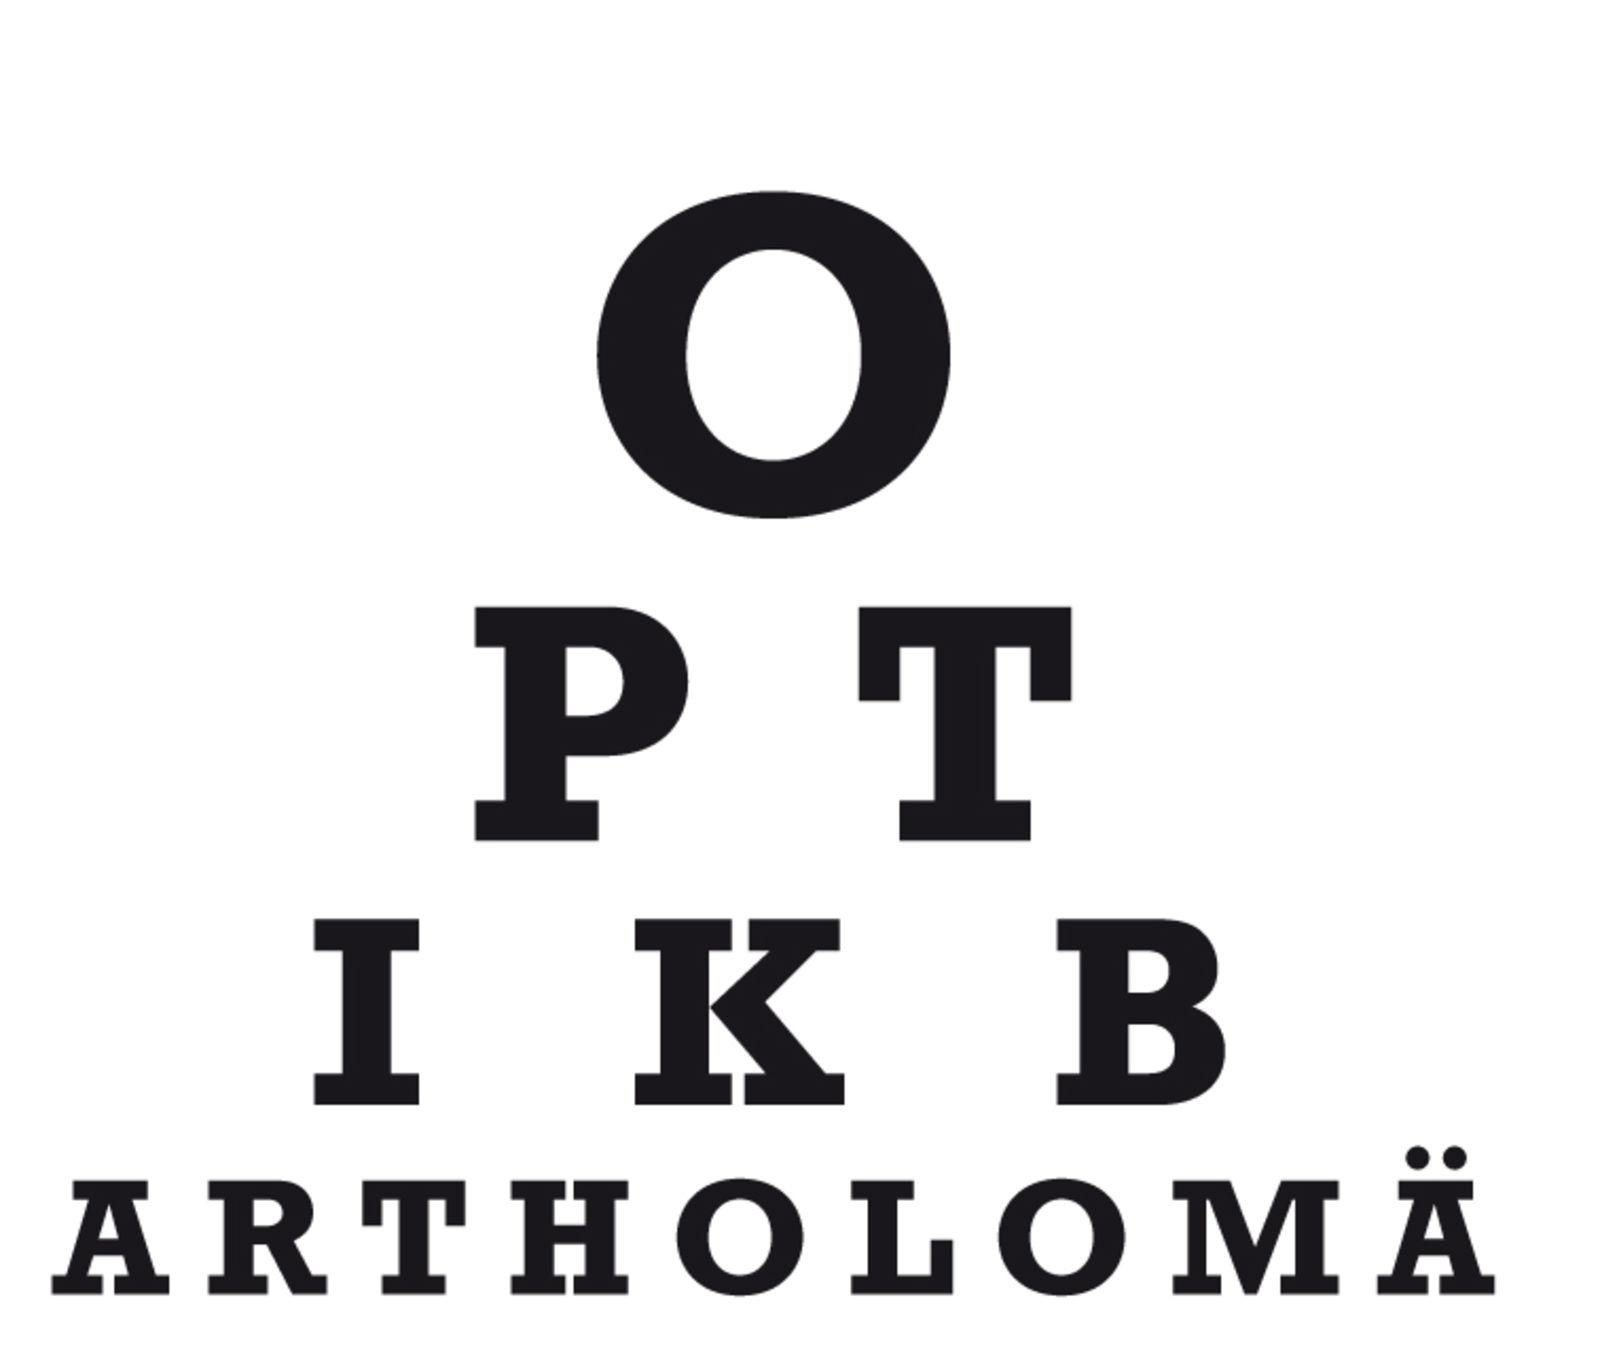 Optik Bartholomä in München (Bild 2)